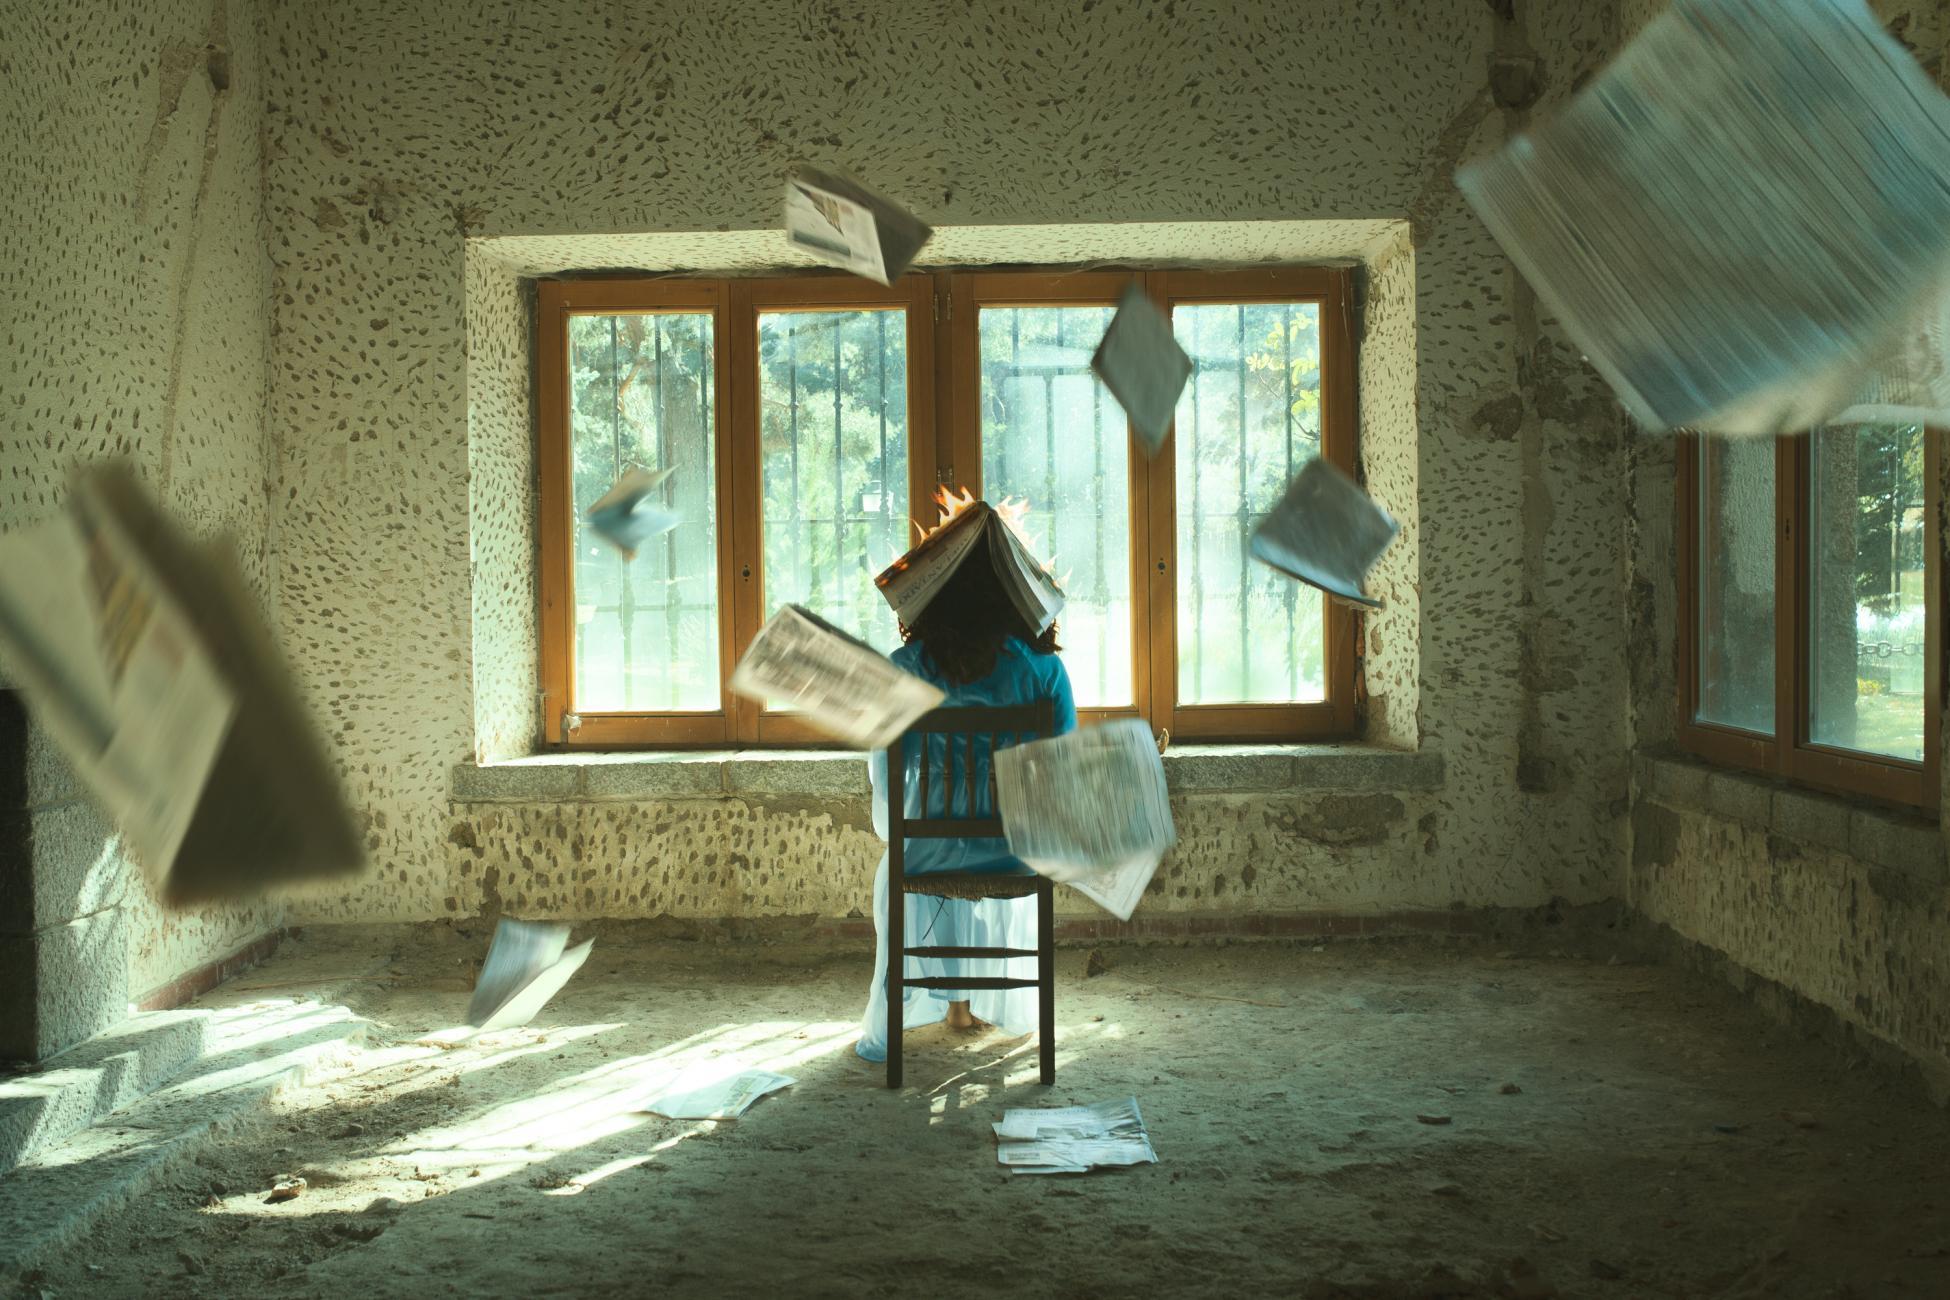 Desinformación /Misinformation (2020) - Tania Olby